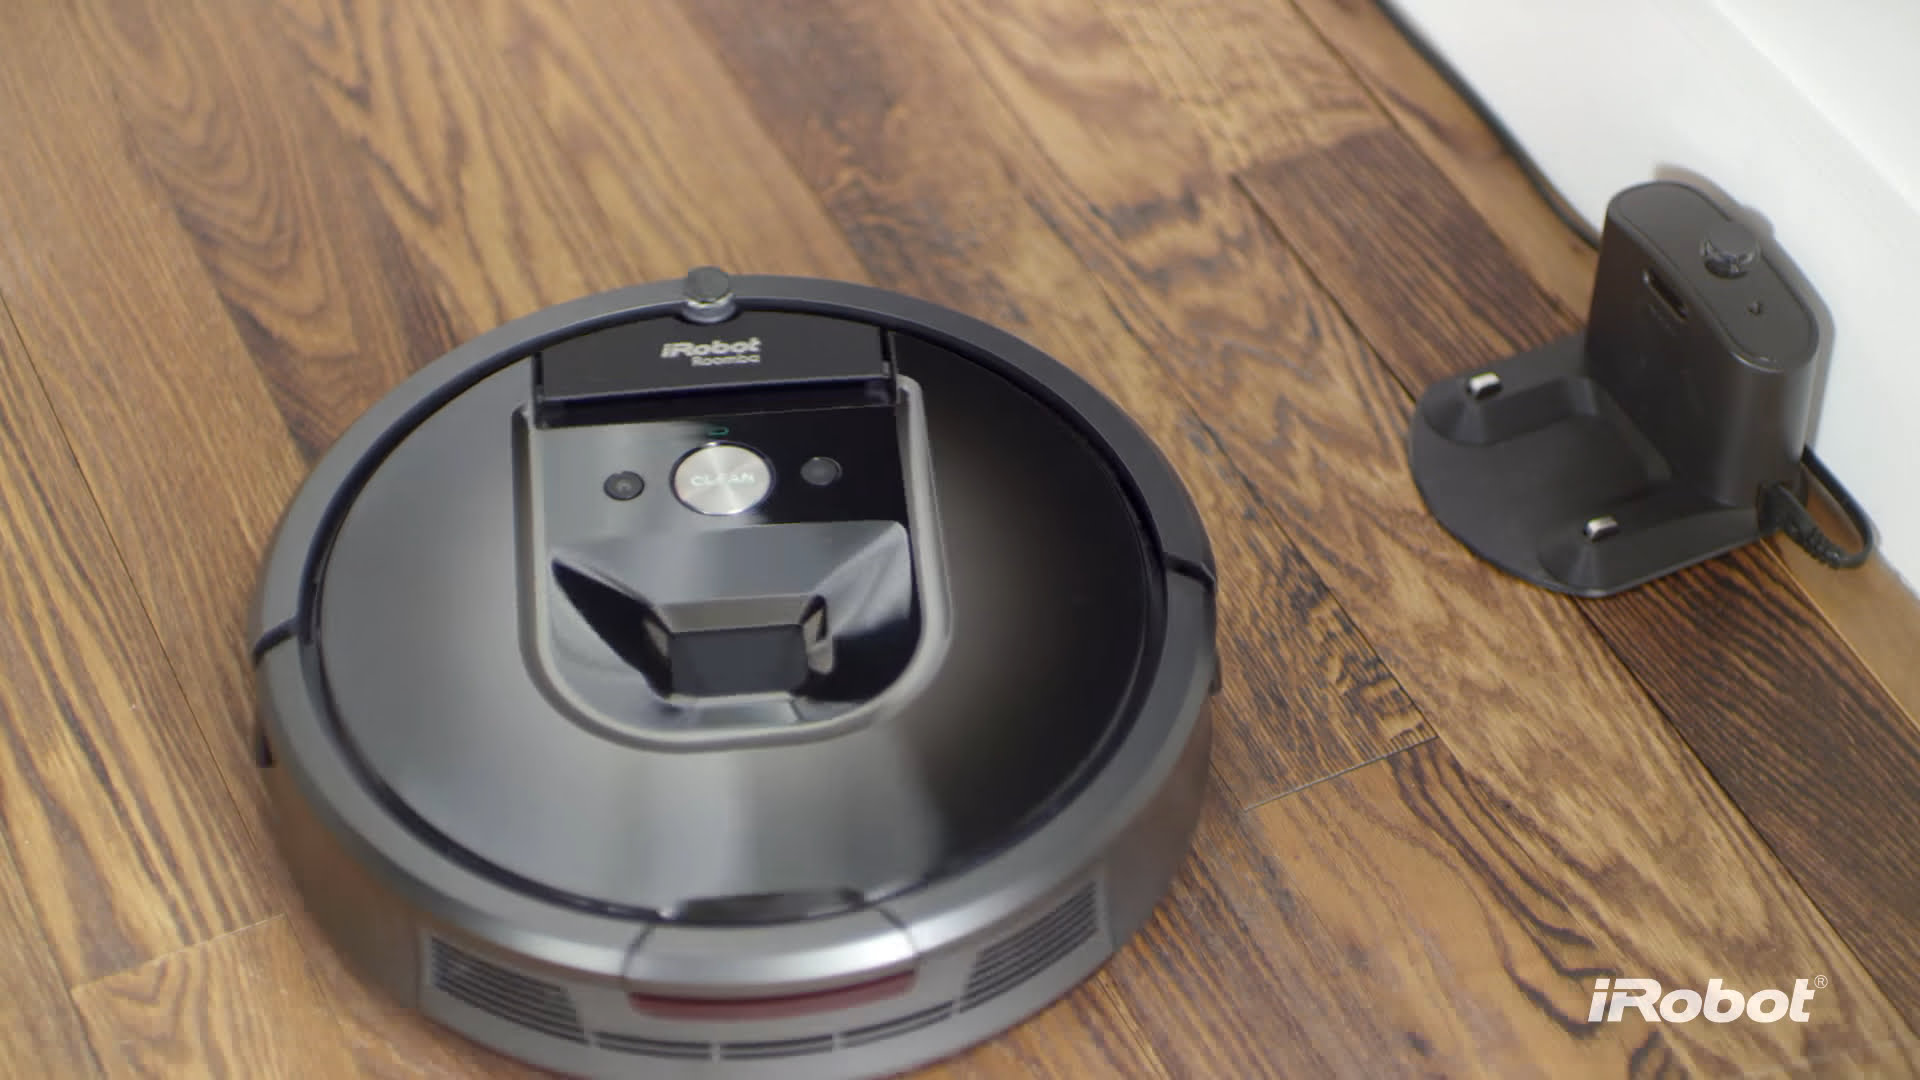 iRobot's Roomba i7+ is a robo-vacuum cleaner